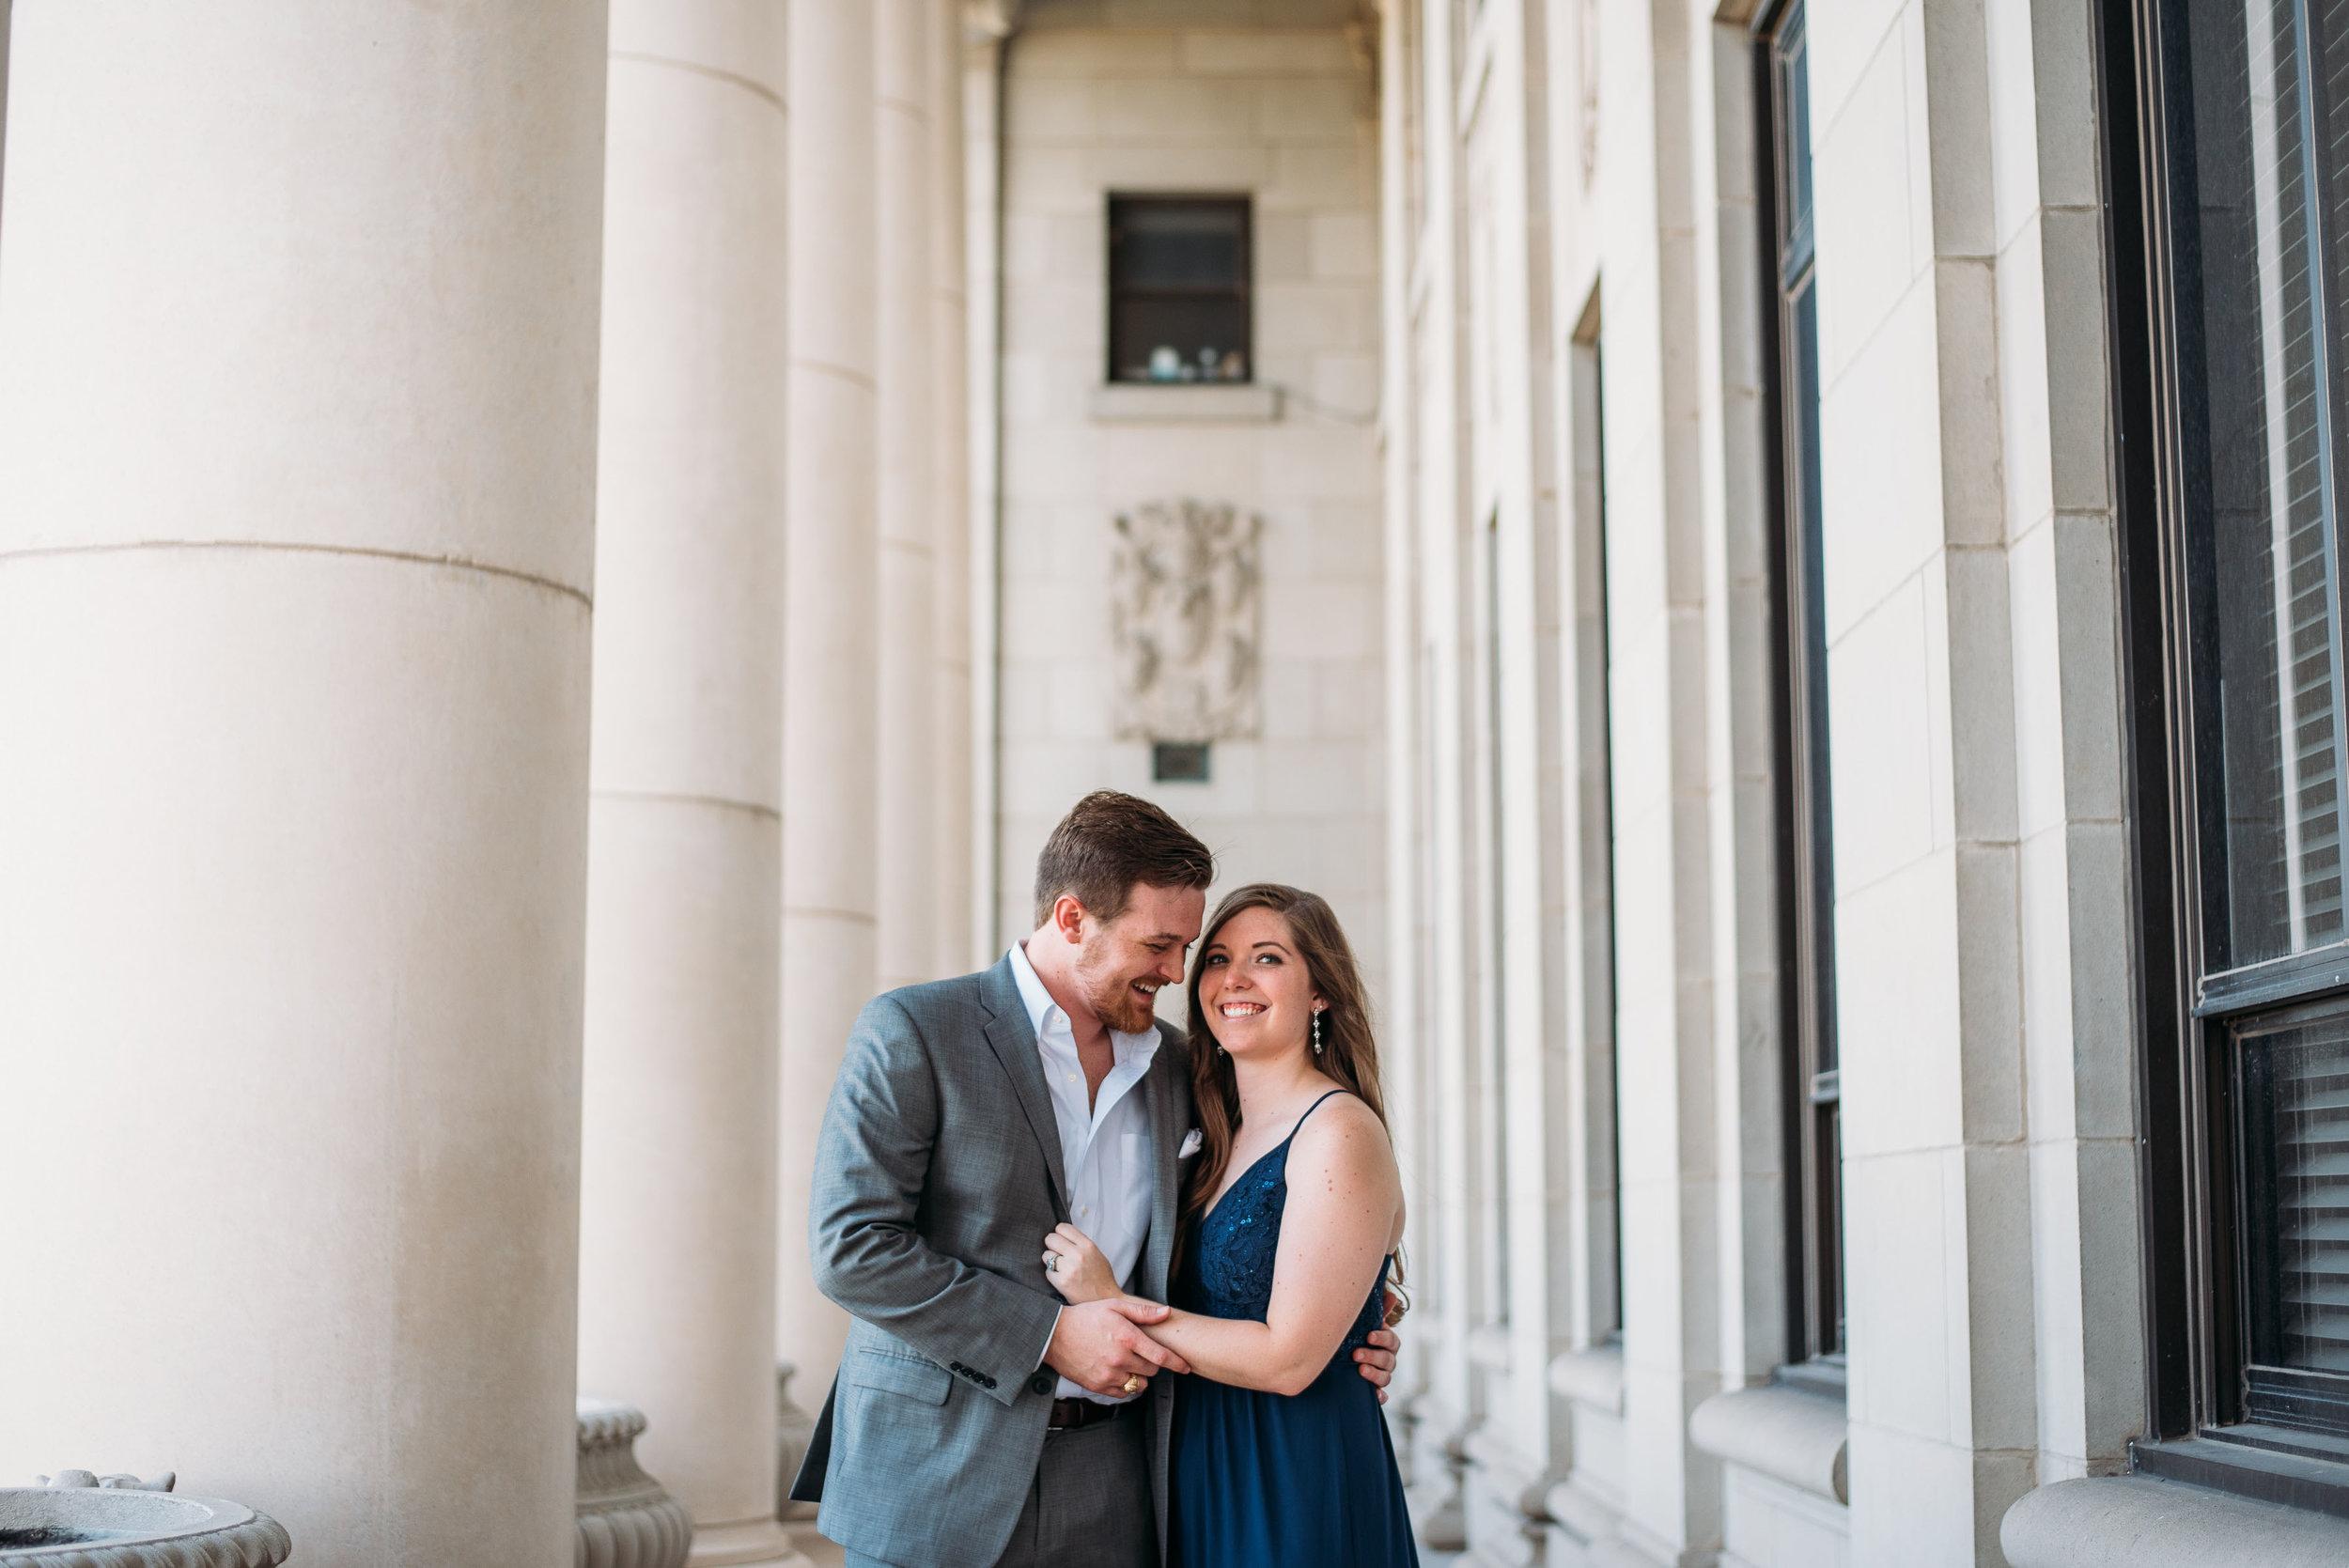 Texas-A&M-University-Engagement-College-Station-Wedding-Photographer-San-Angel-Photo-Mark-Johanna-Century-Tree-02.jpg